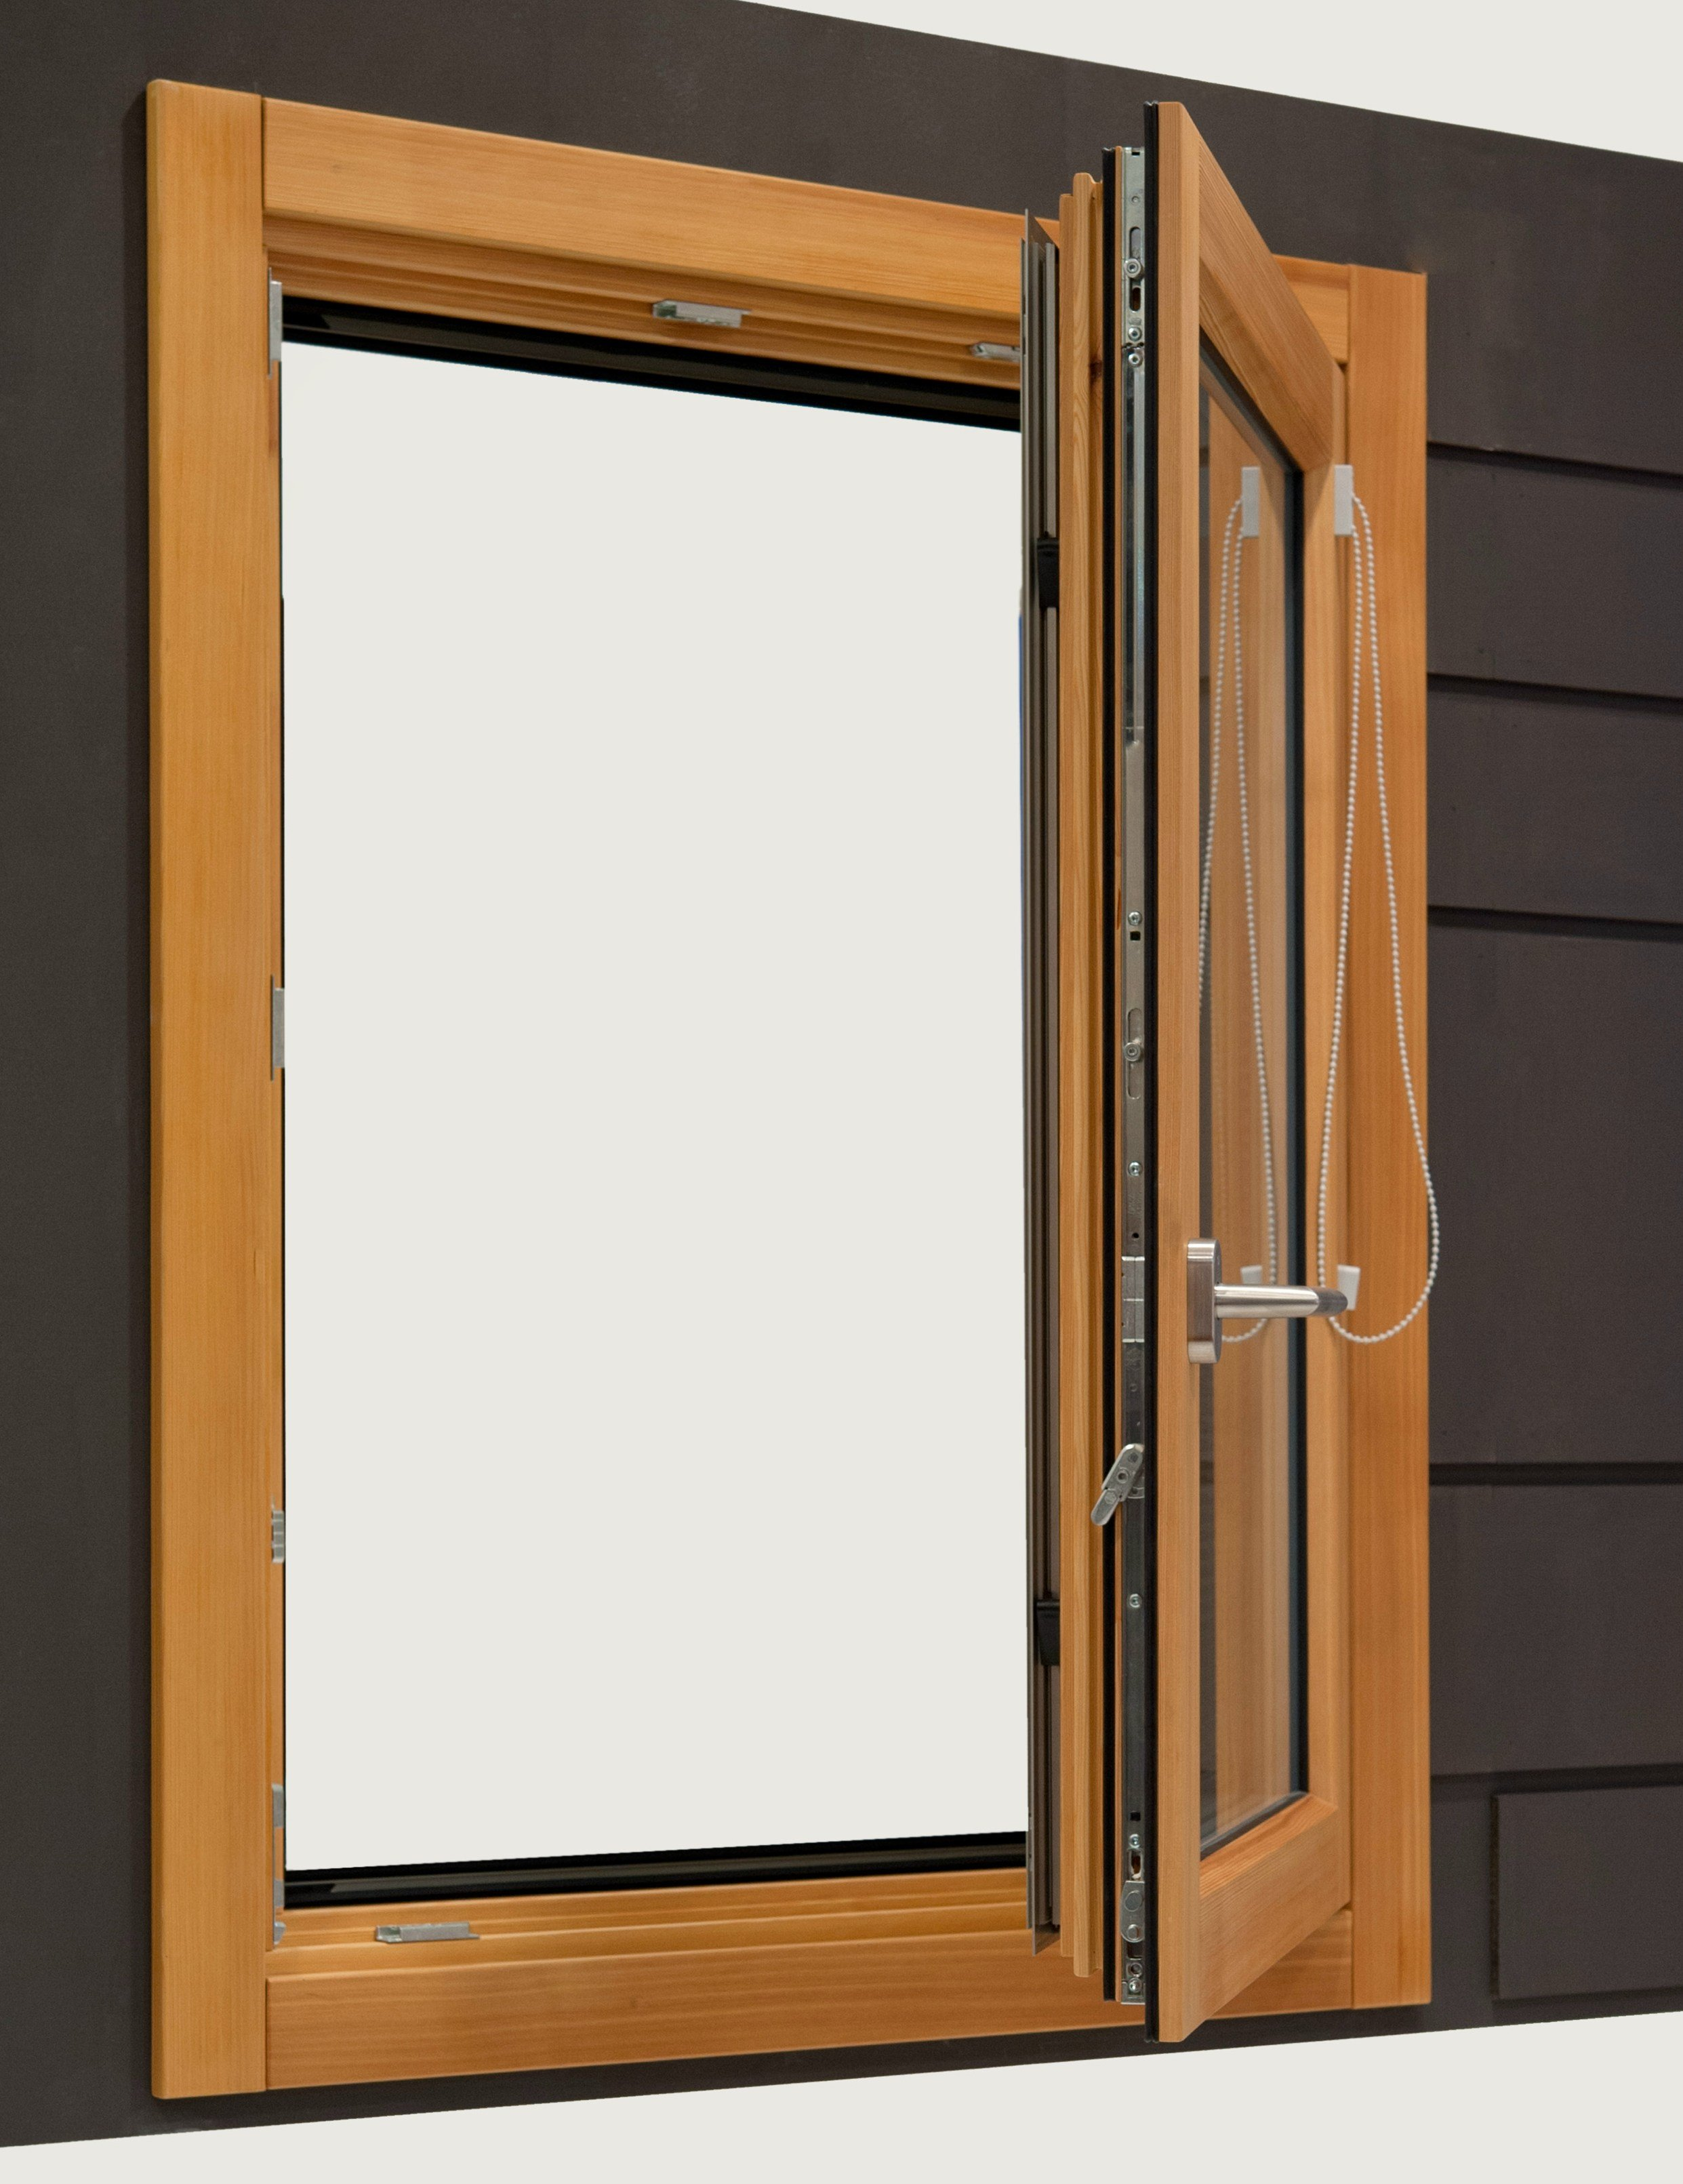 #764B23 invólucro janelas janelas janelas de alumínio madeira 1672 Janela De Aluminio Manutenção